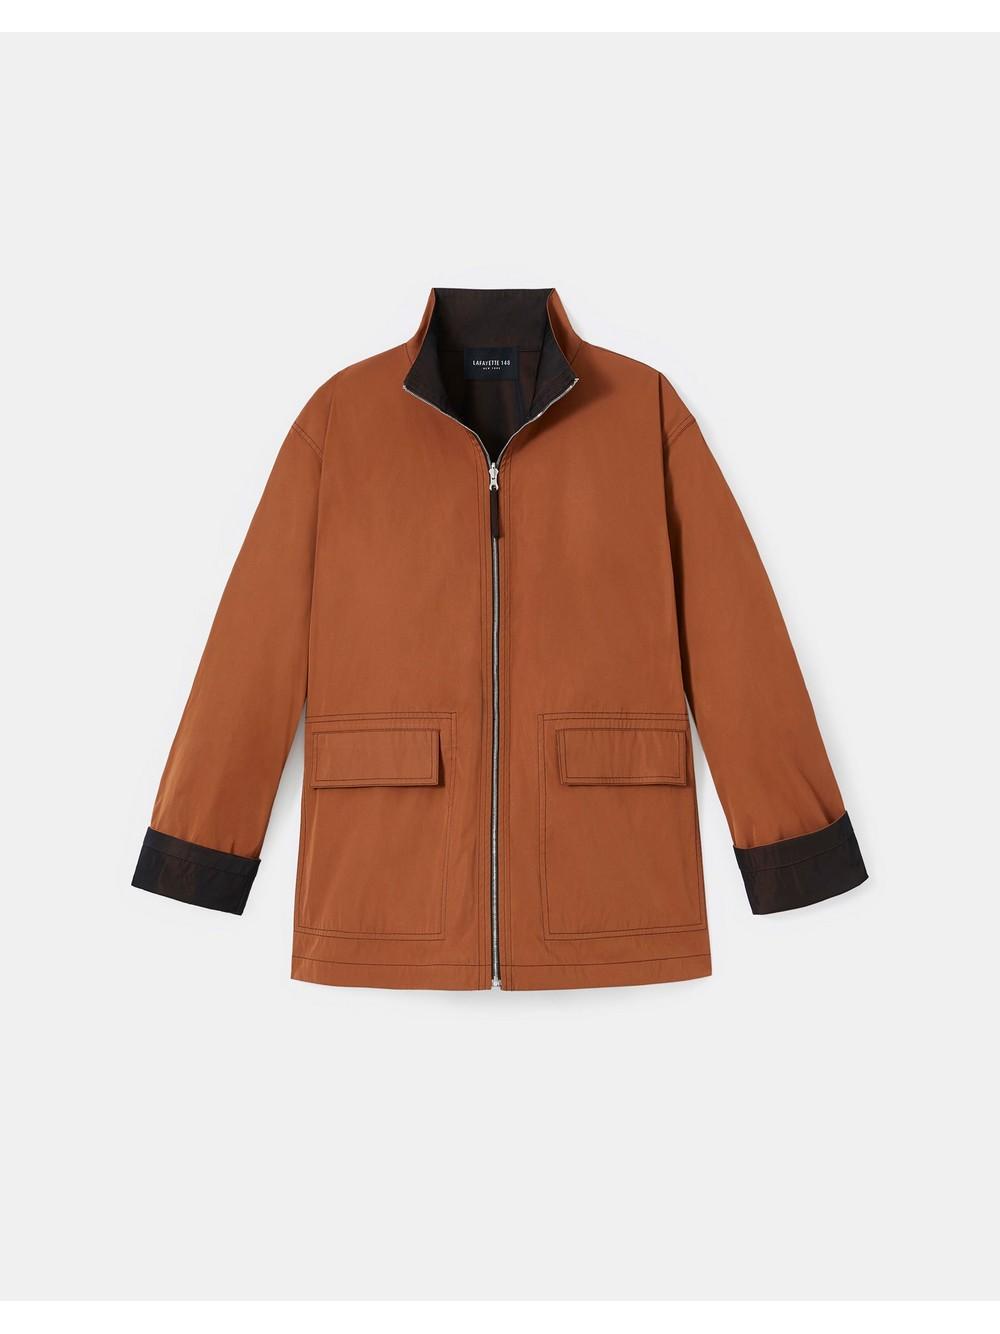 Riener Reversible Jacket